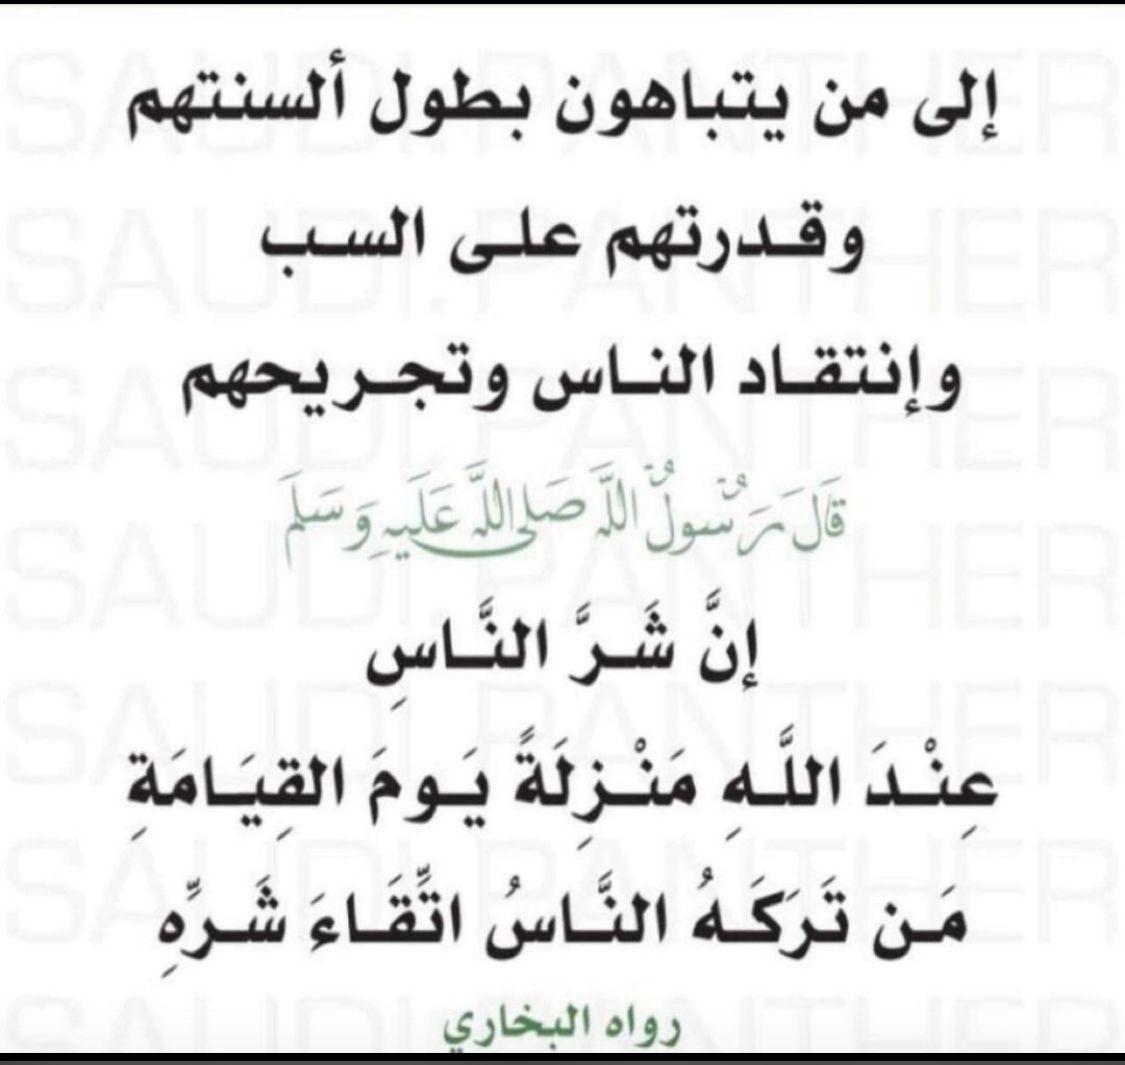 شر الناس Quran Quotes Love Quran Quotes Quotes